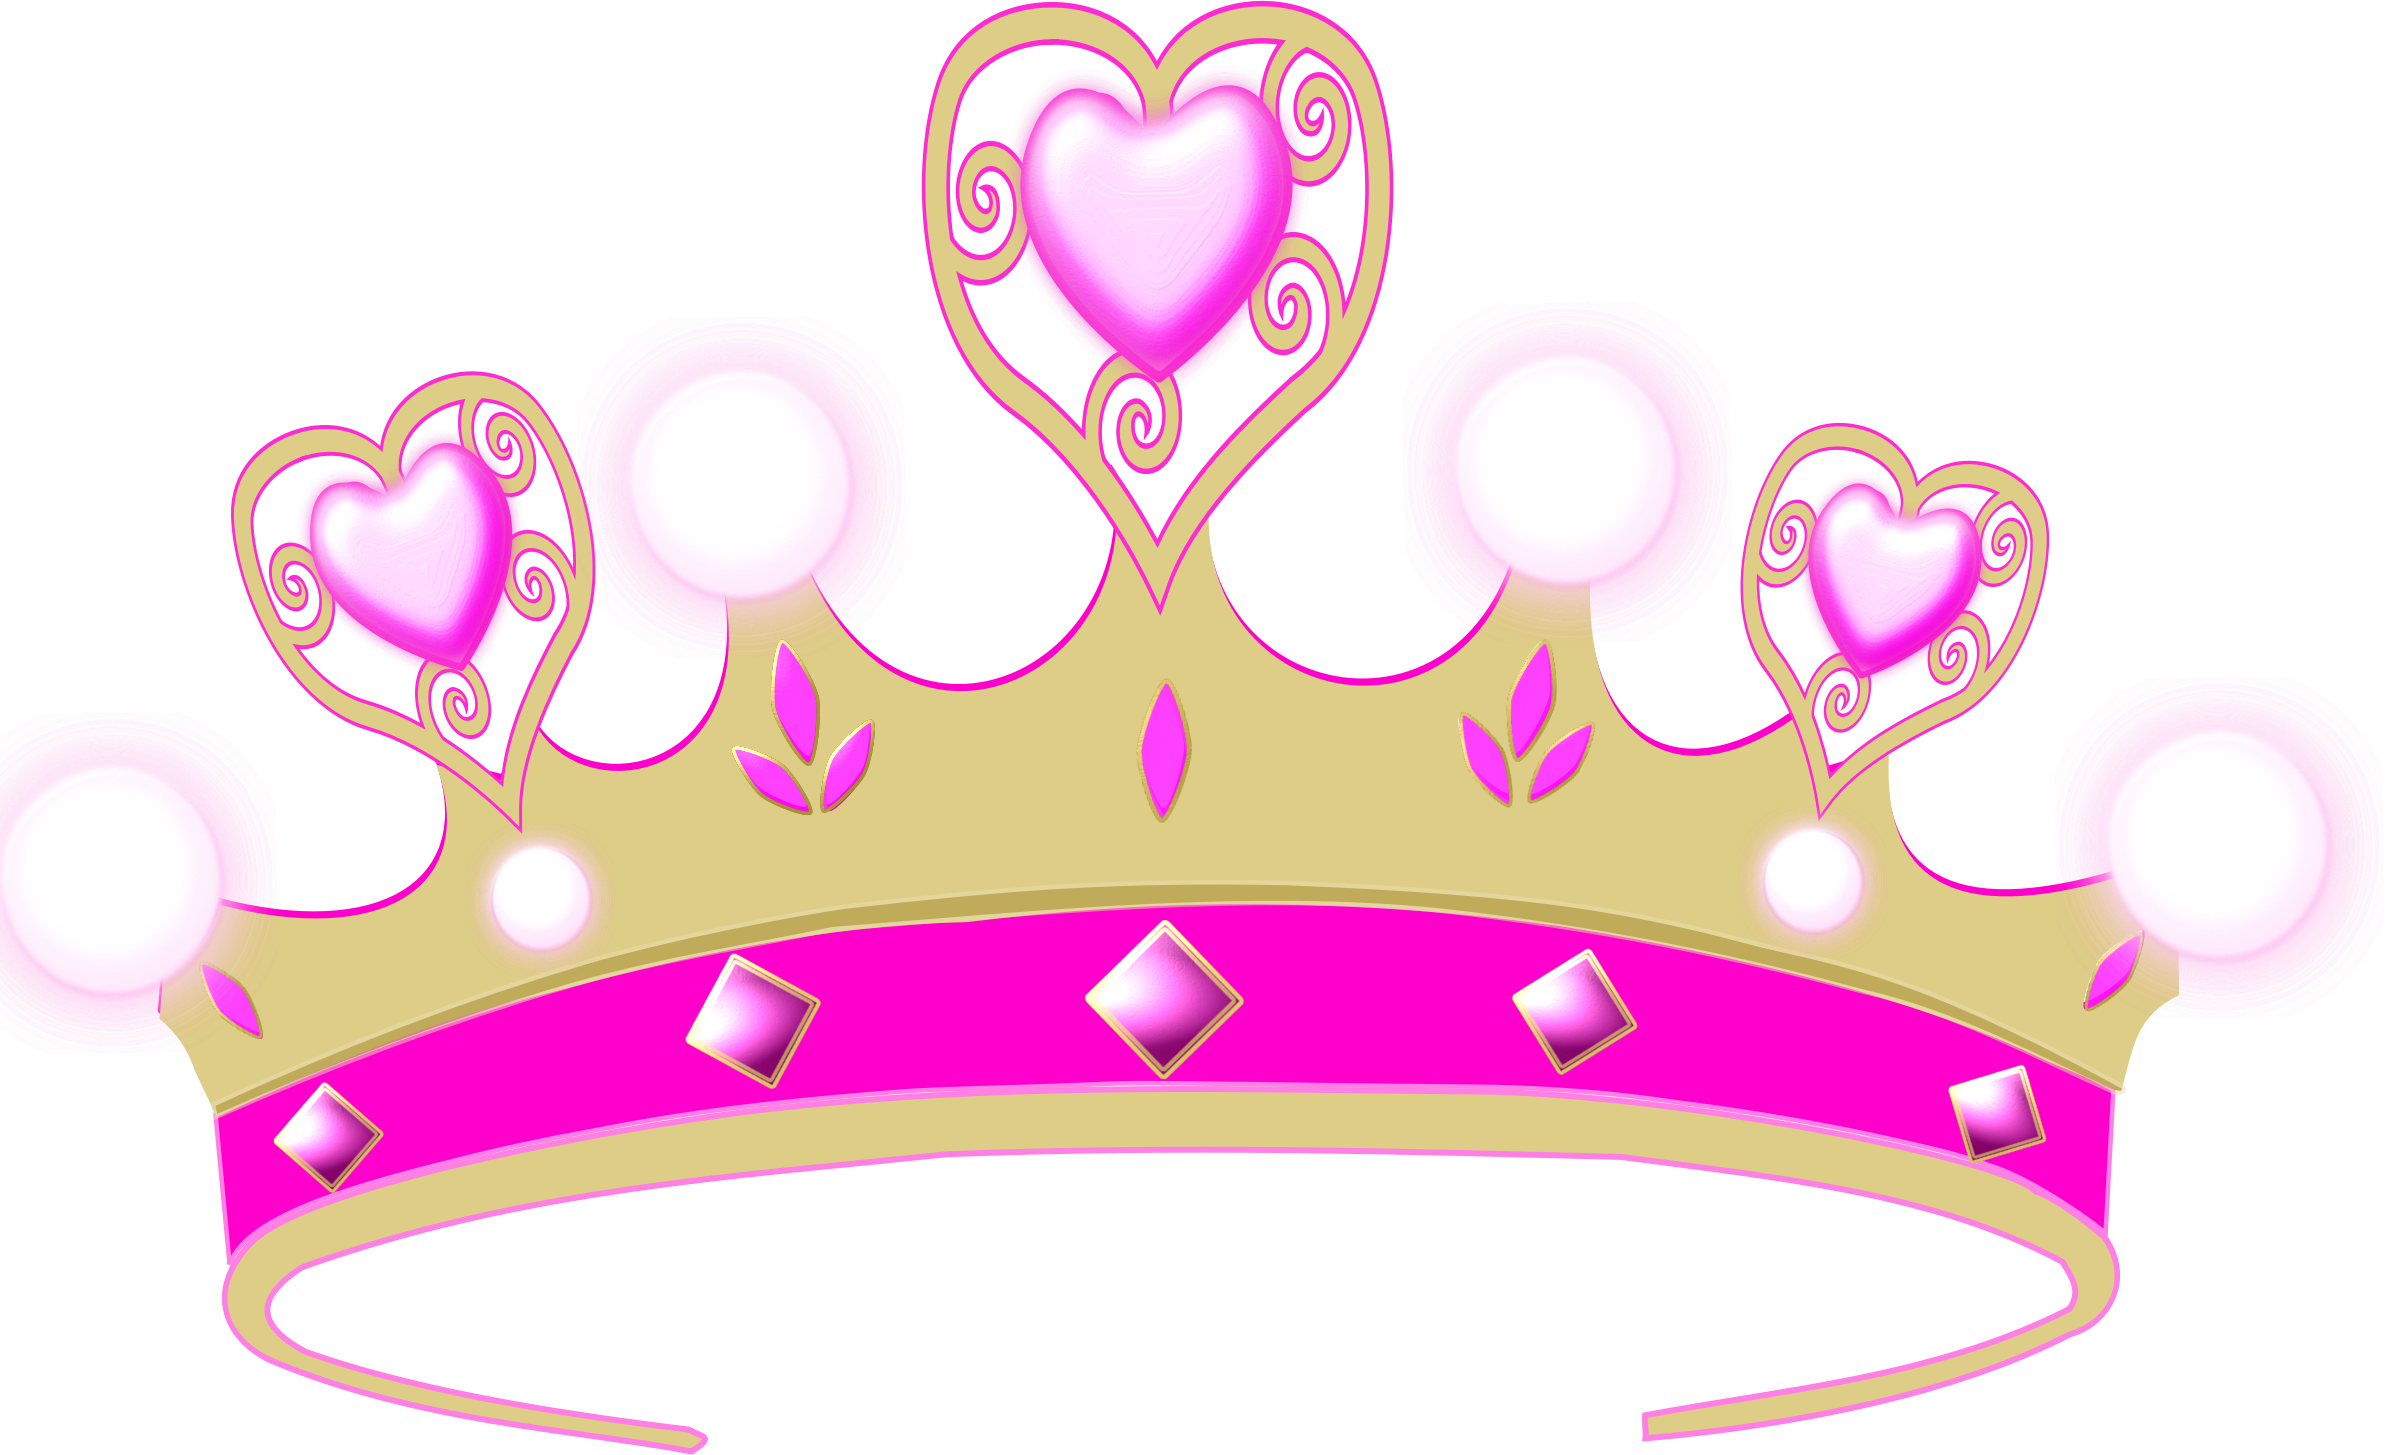 Princess Crown Free Clip Art Crown Clip Art Clip Art